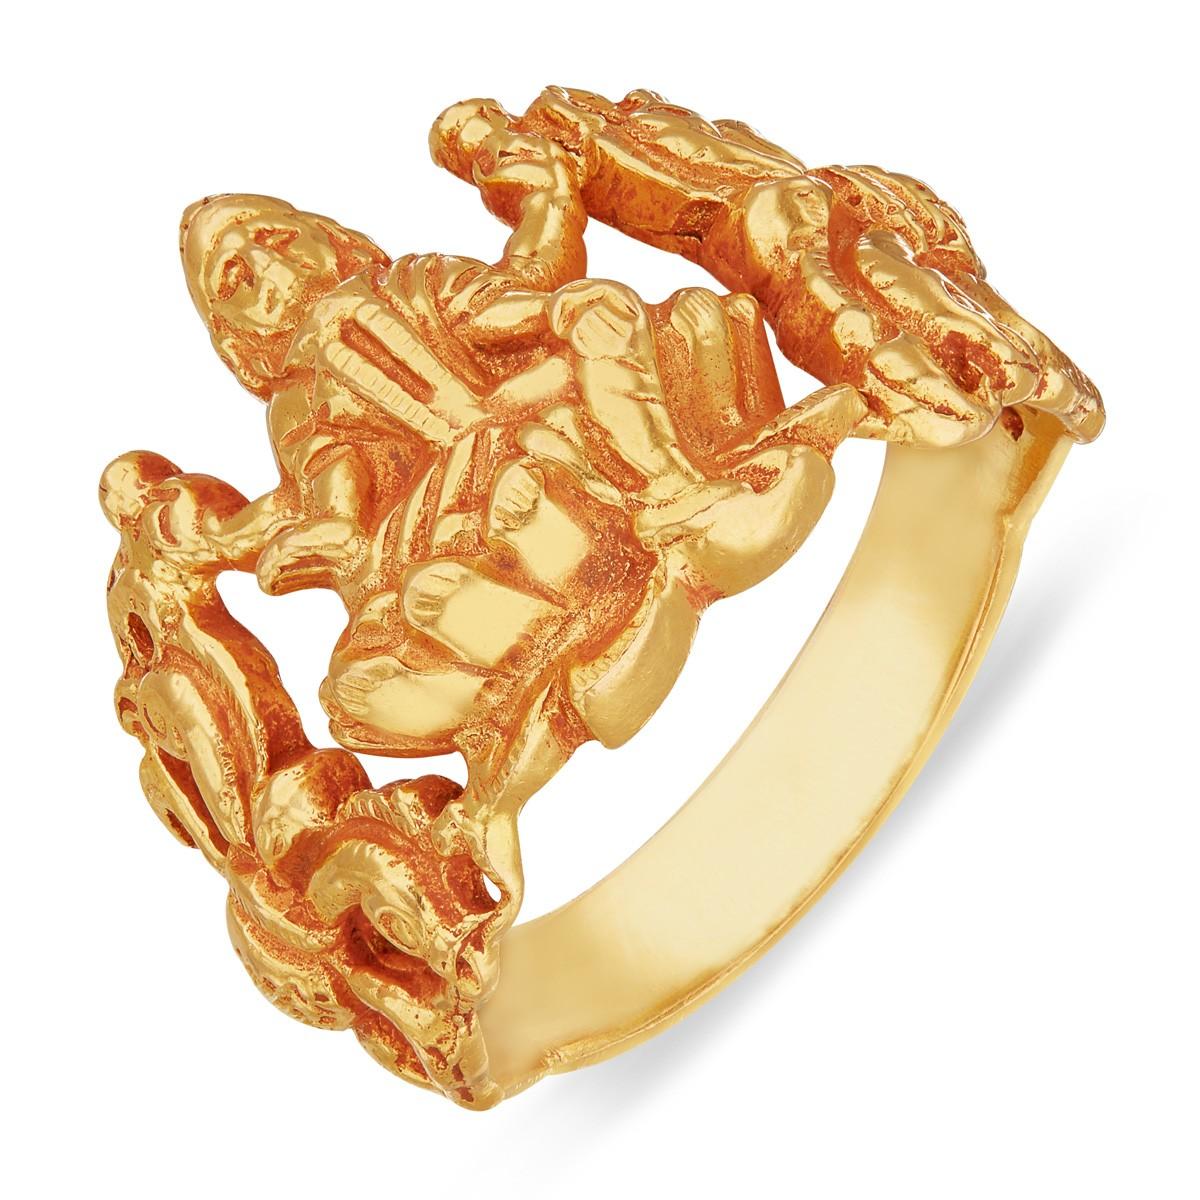 Mahalakshmi Yellow Gold Ring Designed Gold Ring India